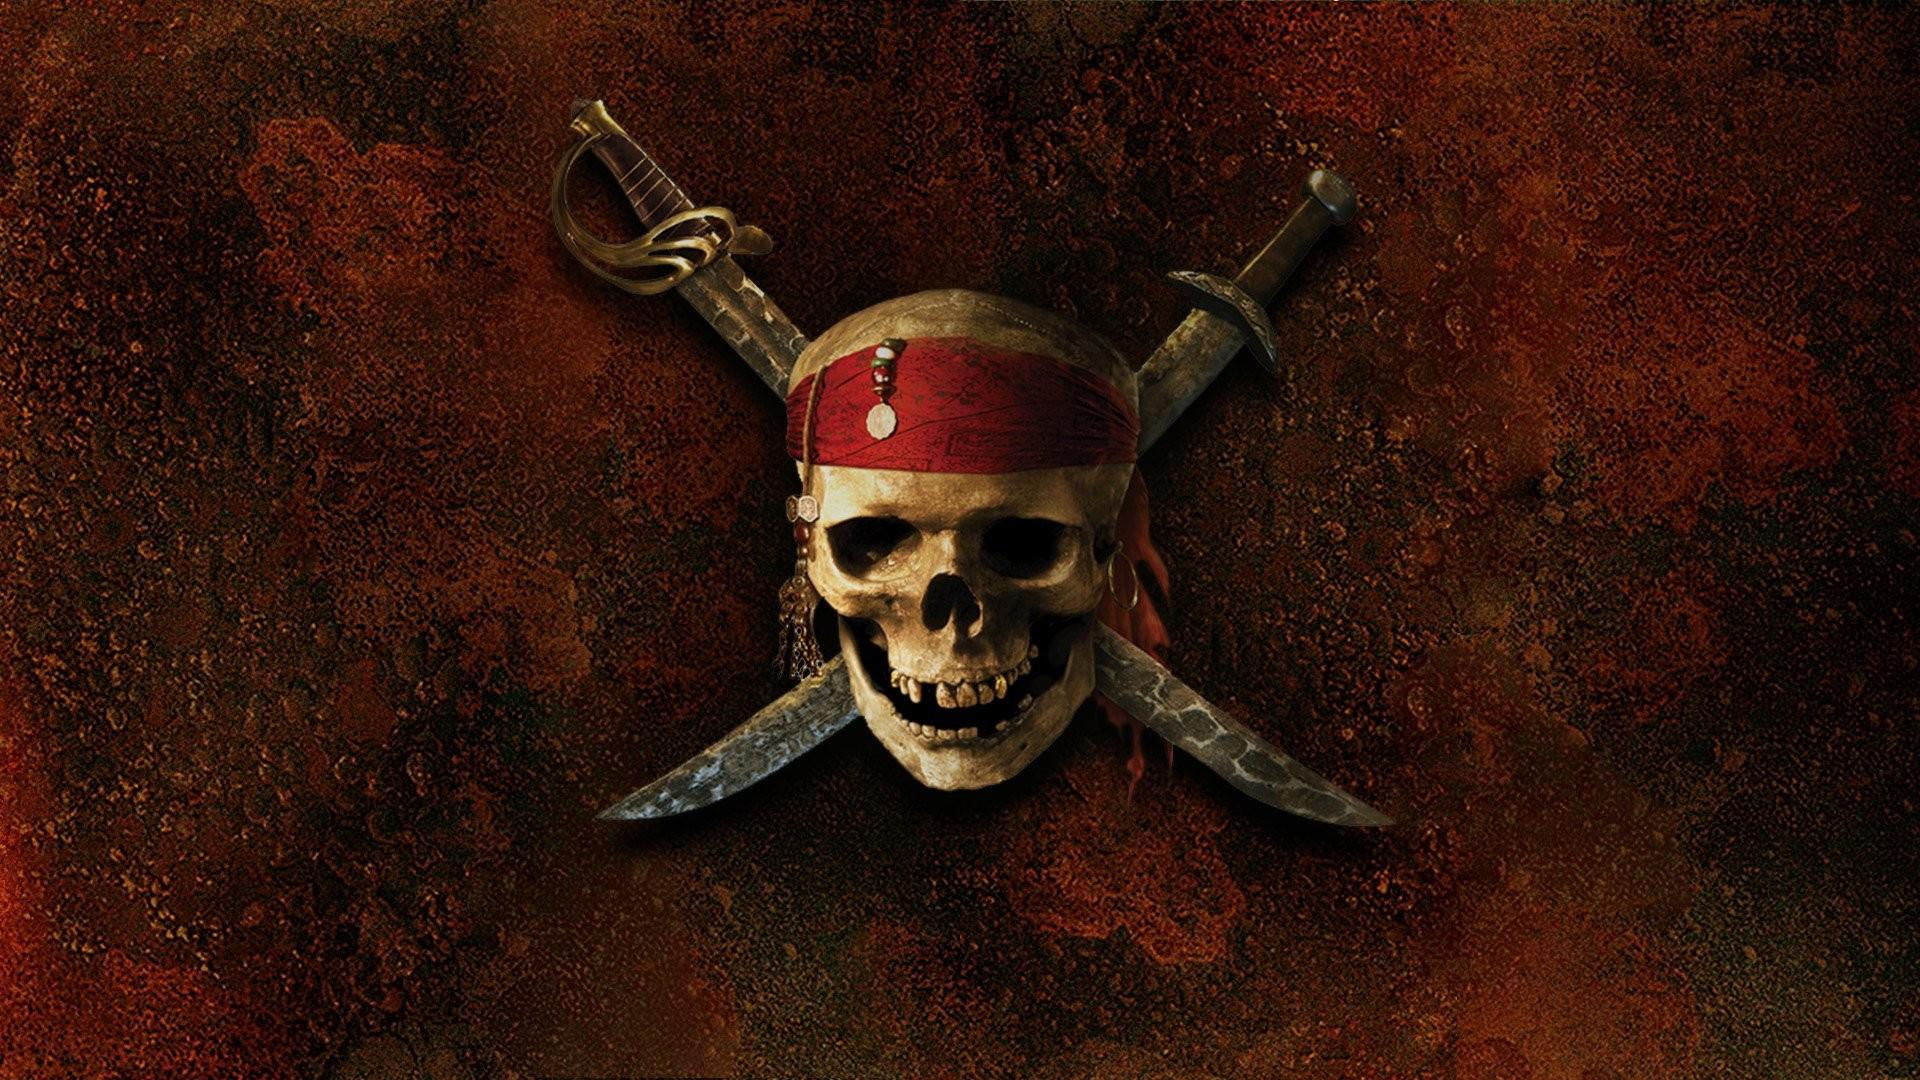 Pirates of the Caribbean pirate ship The Brig Unicorn